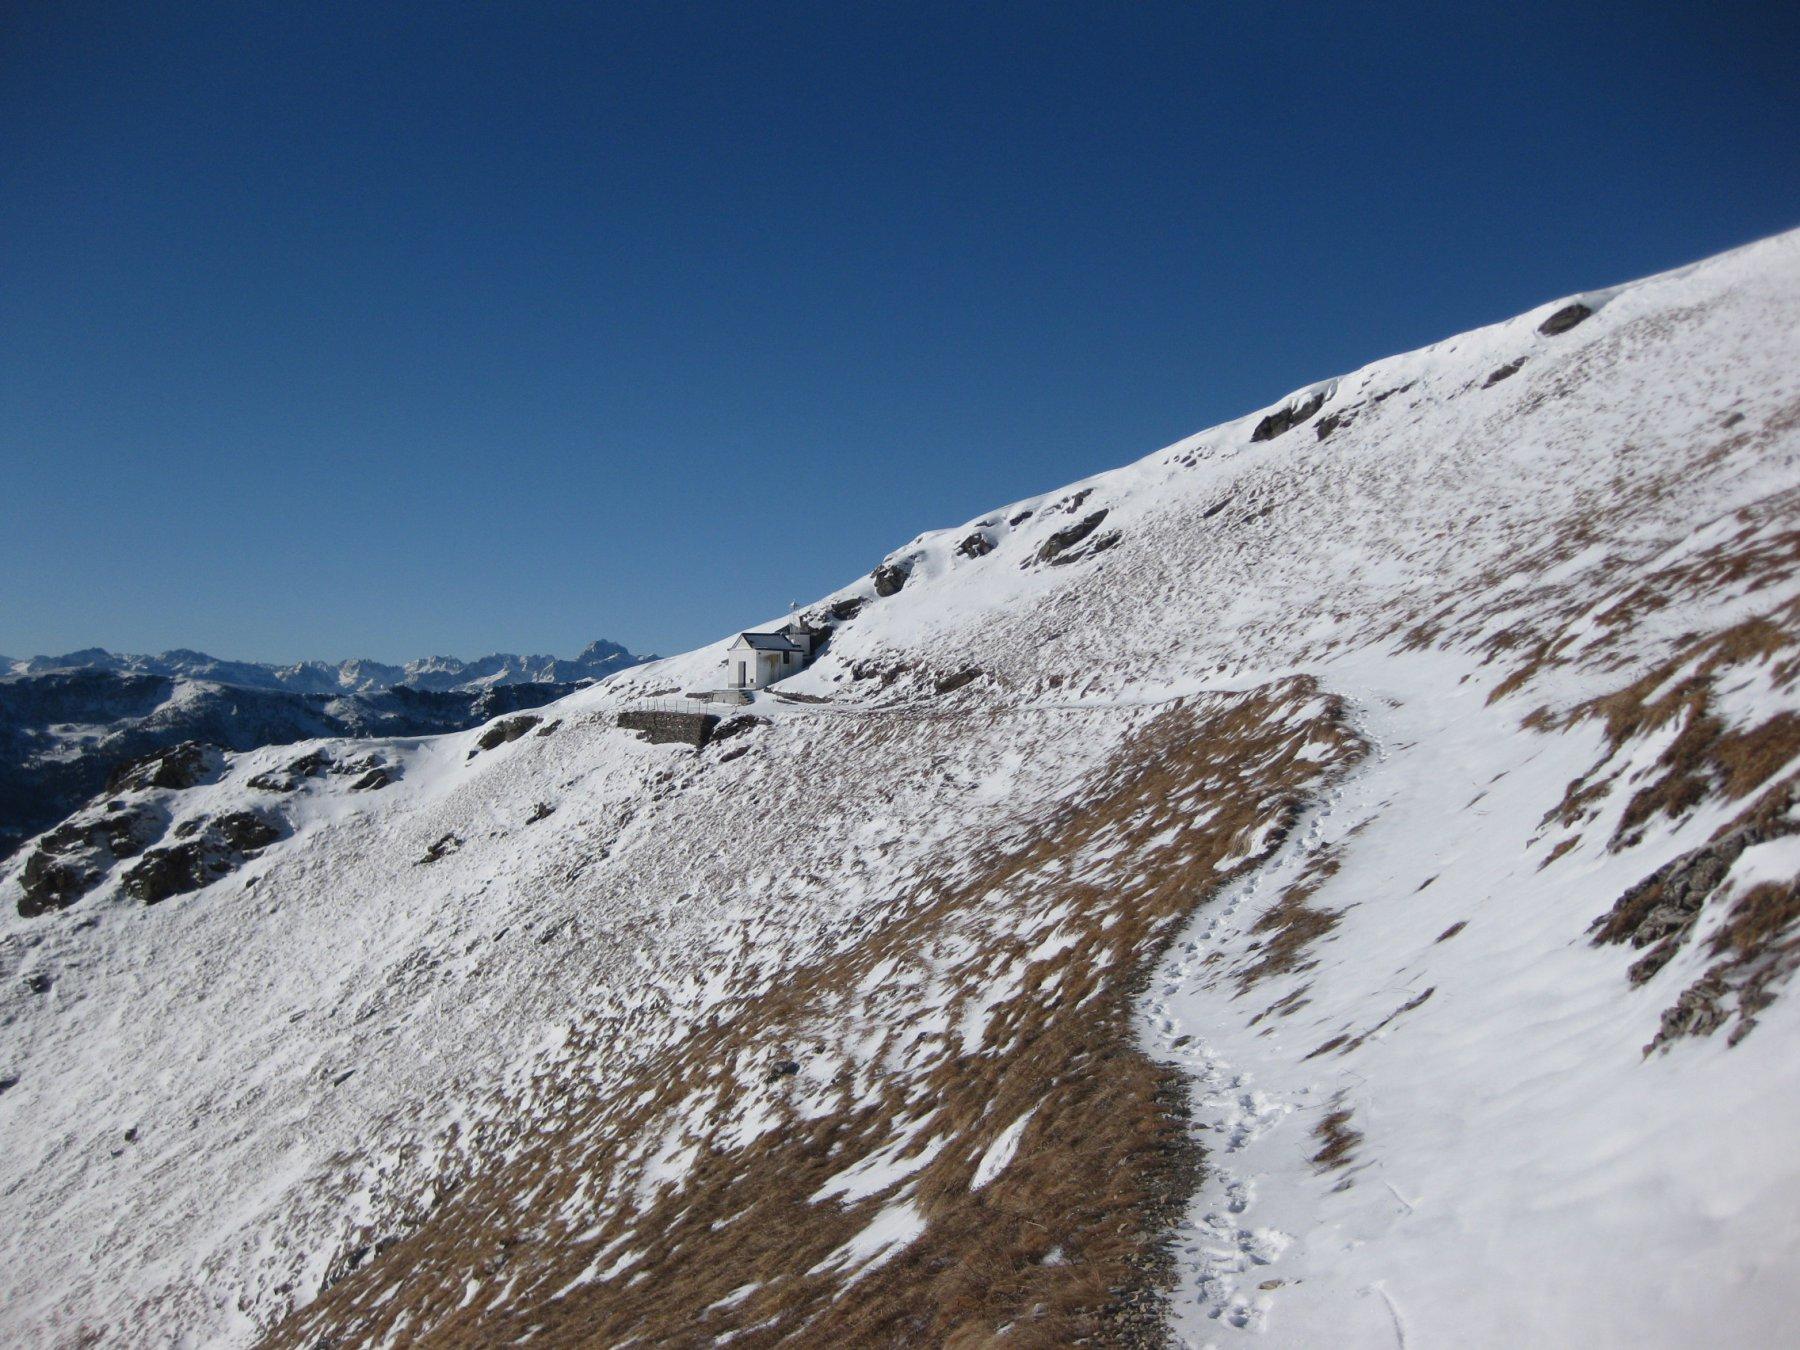 verso la cappella alpina